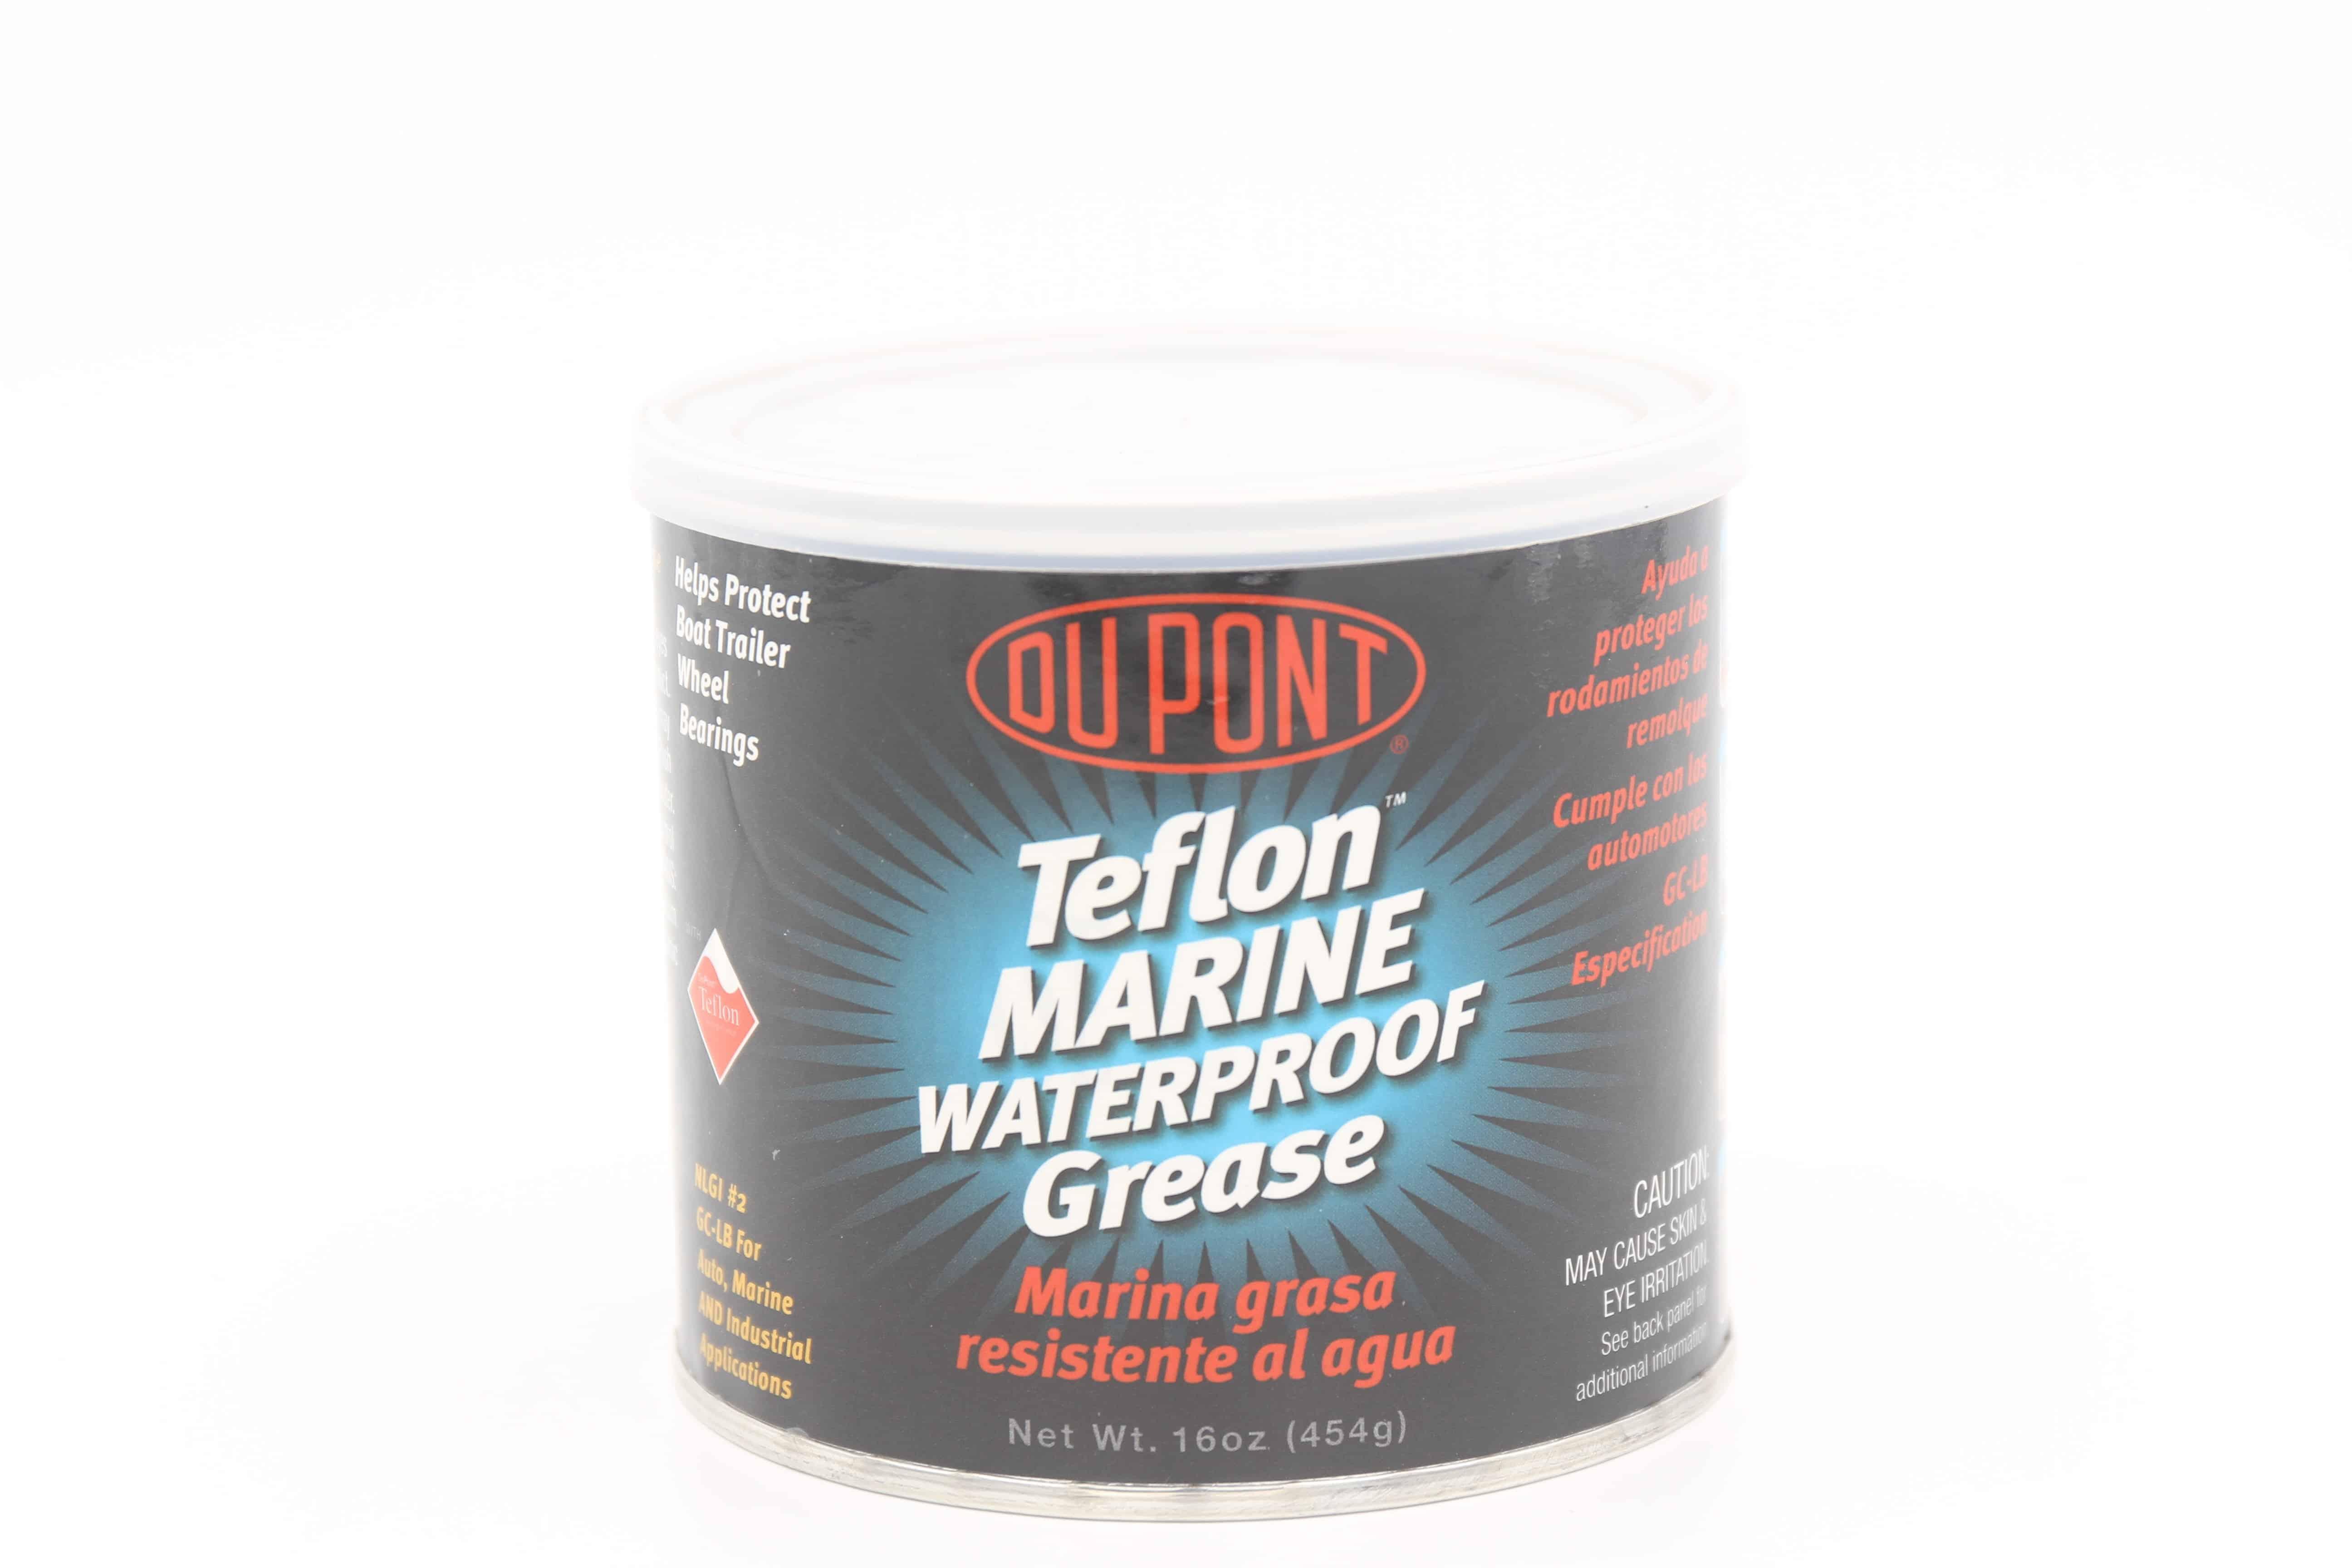 teflon-marine-grease - Miller-Stephenson Chemicals